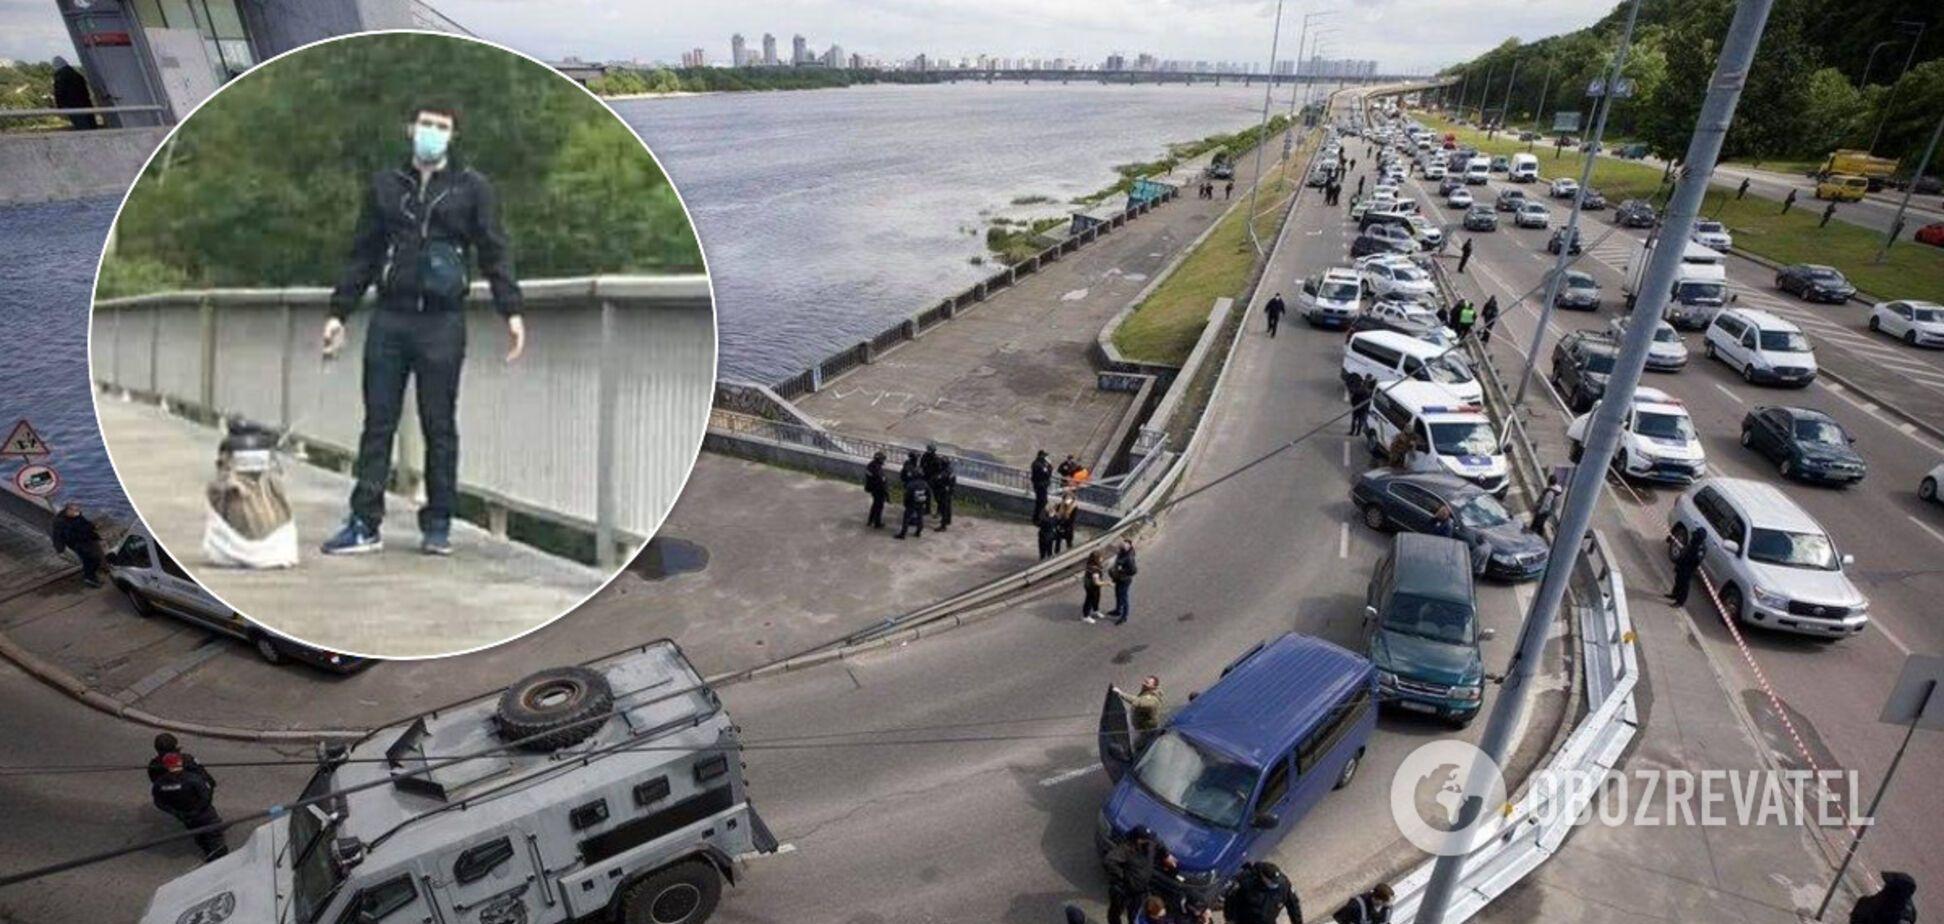 'Минер' моста Метро был неадекватен: полиция озвучила детали